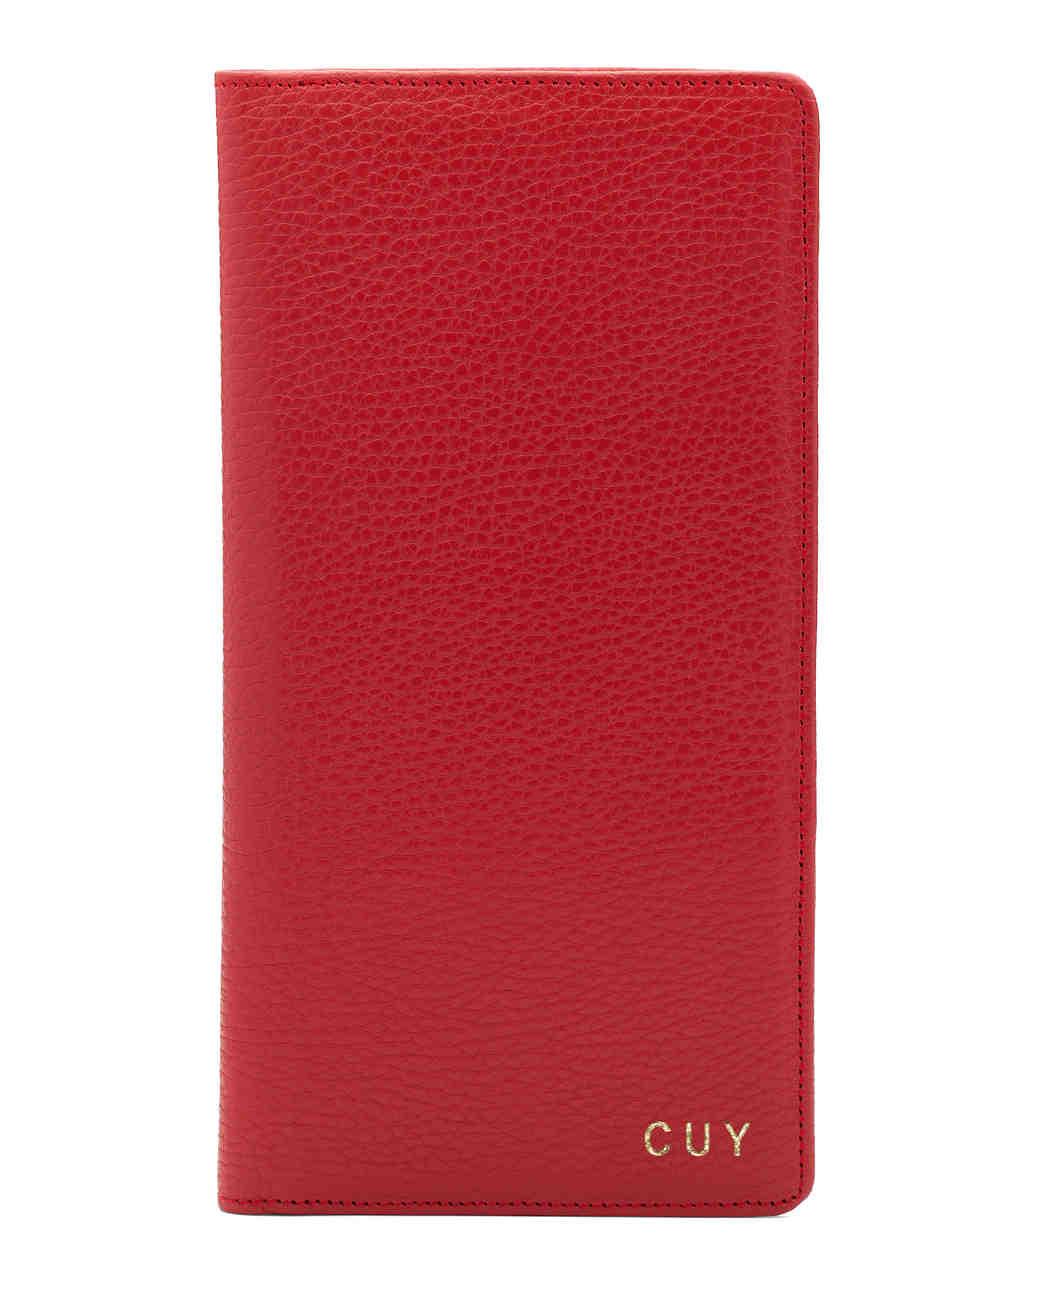 valentines-gift-guide-her-cuyana-passport-wallet-0115.jpg